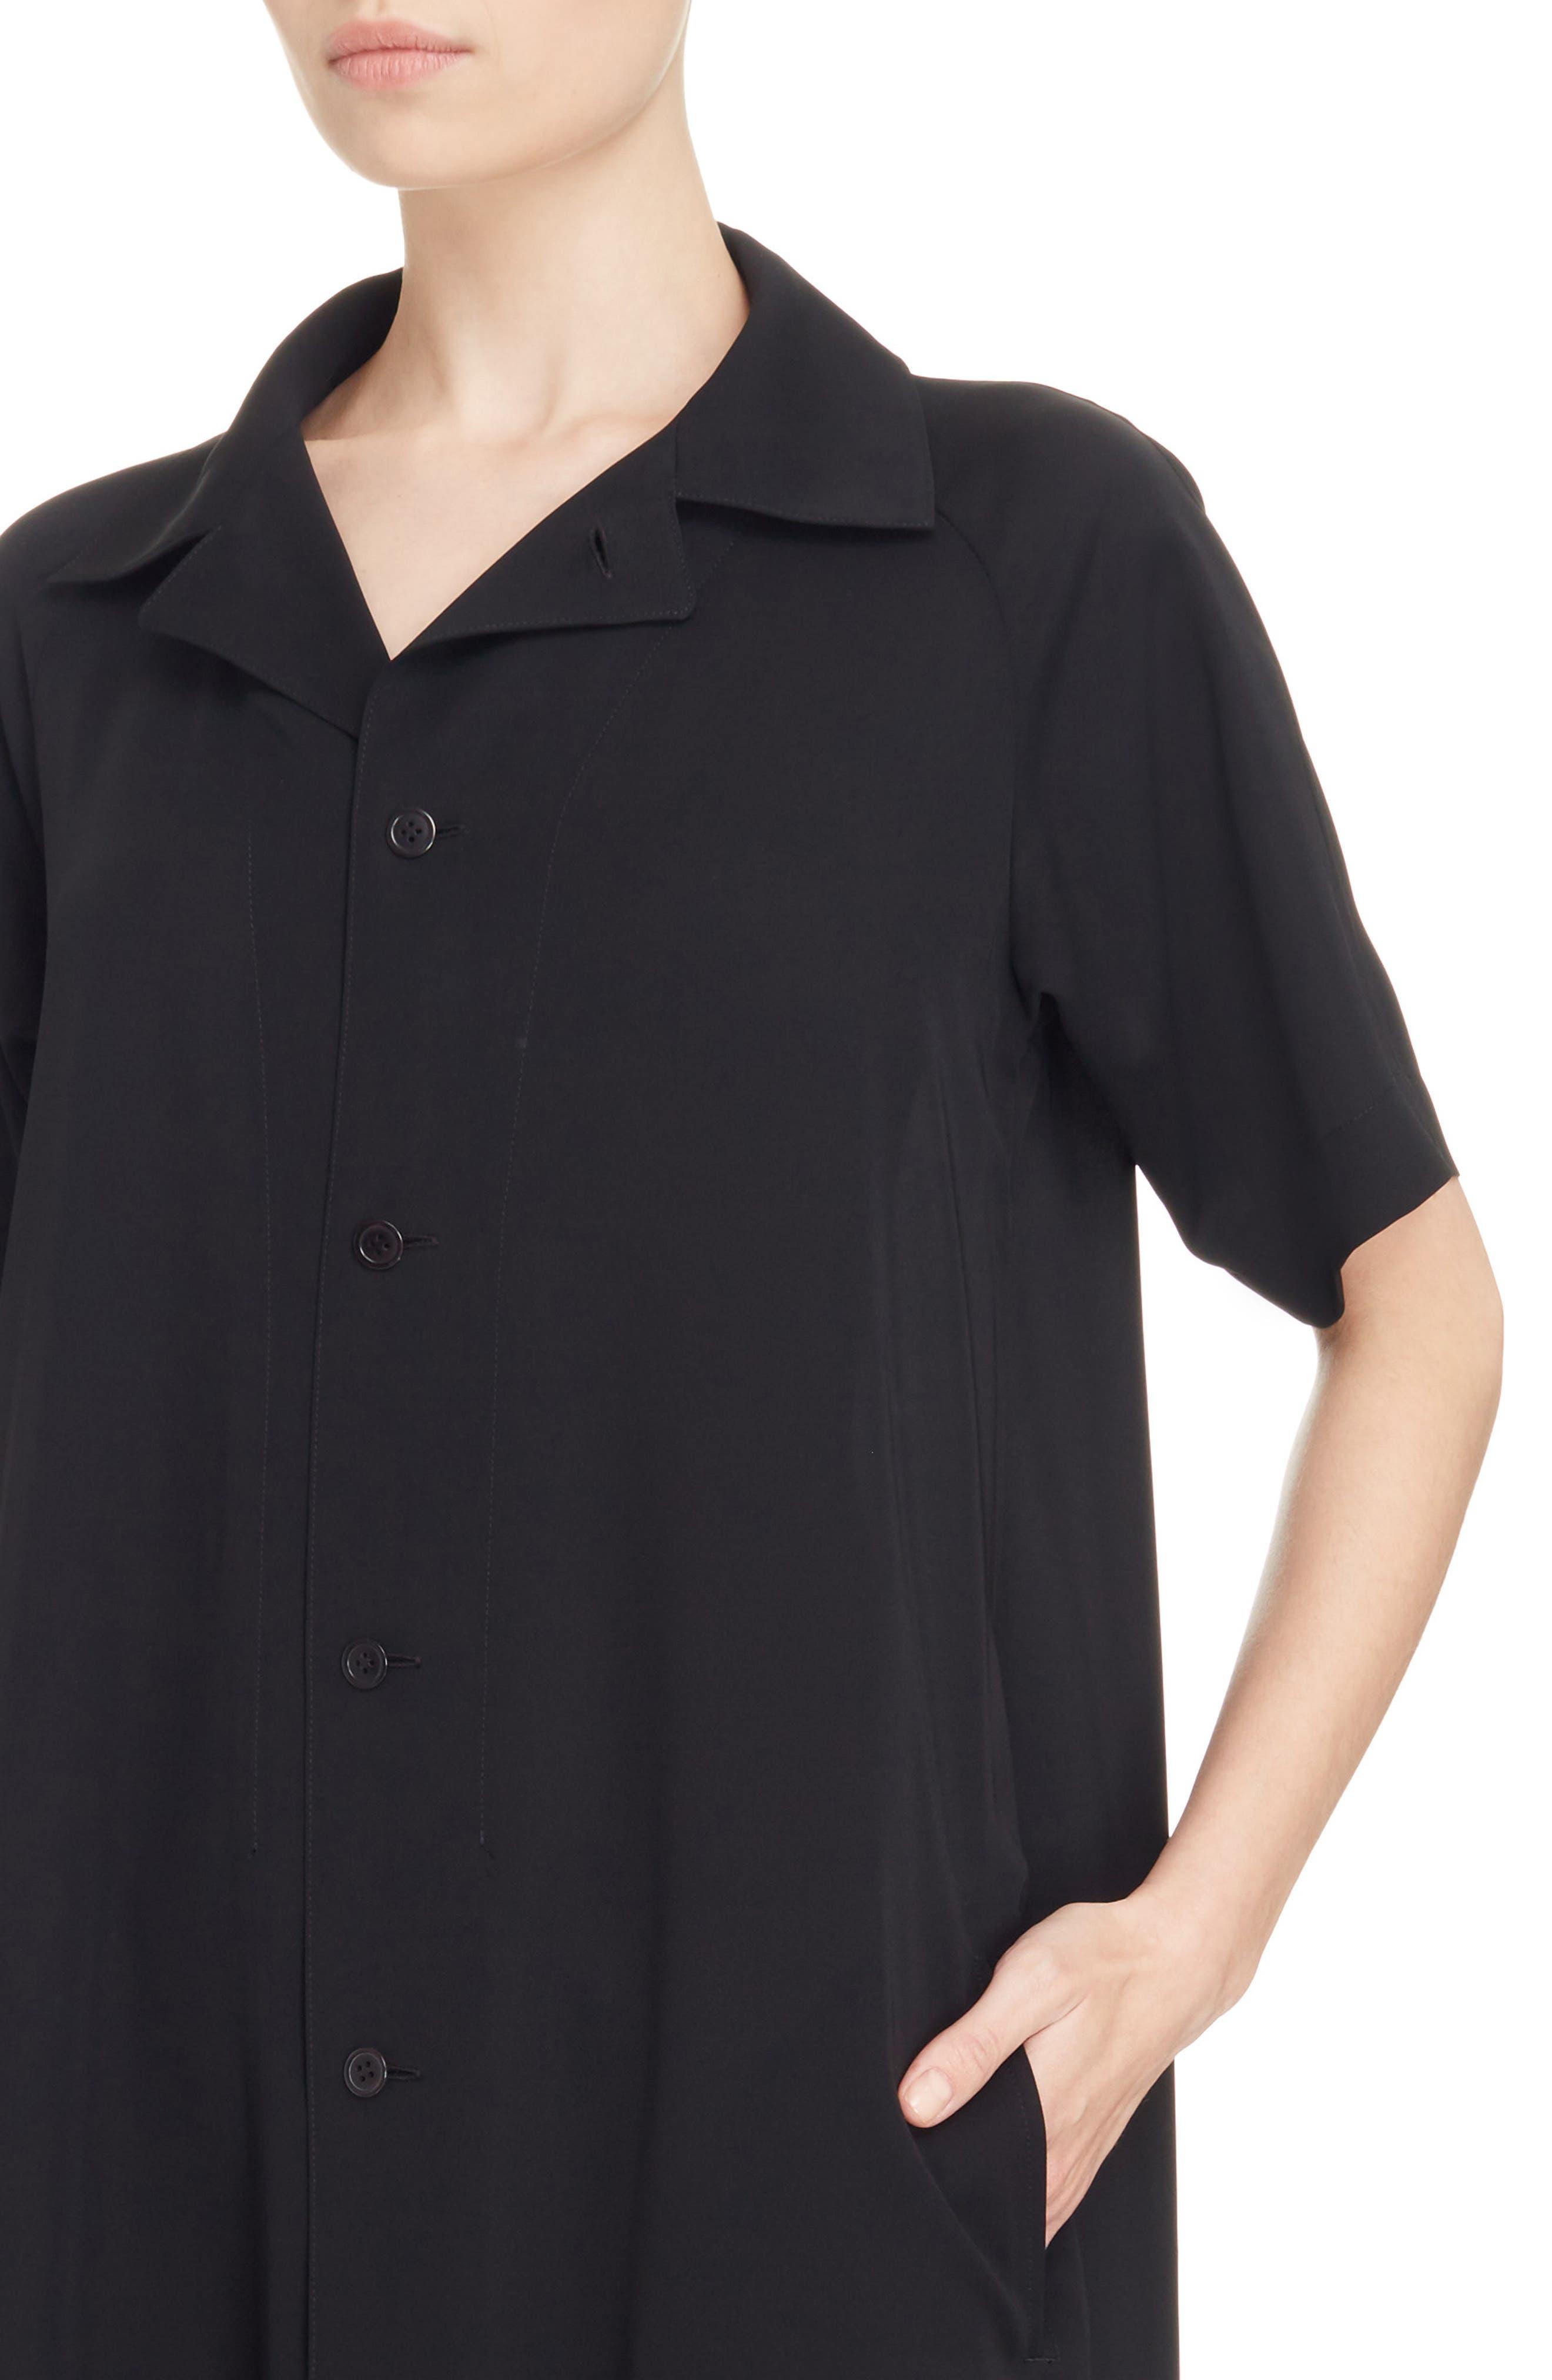 Oversize Shirtdress,                             Alternate thumbnail 4, color,                             Black